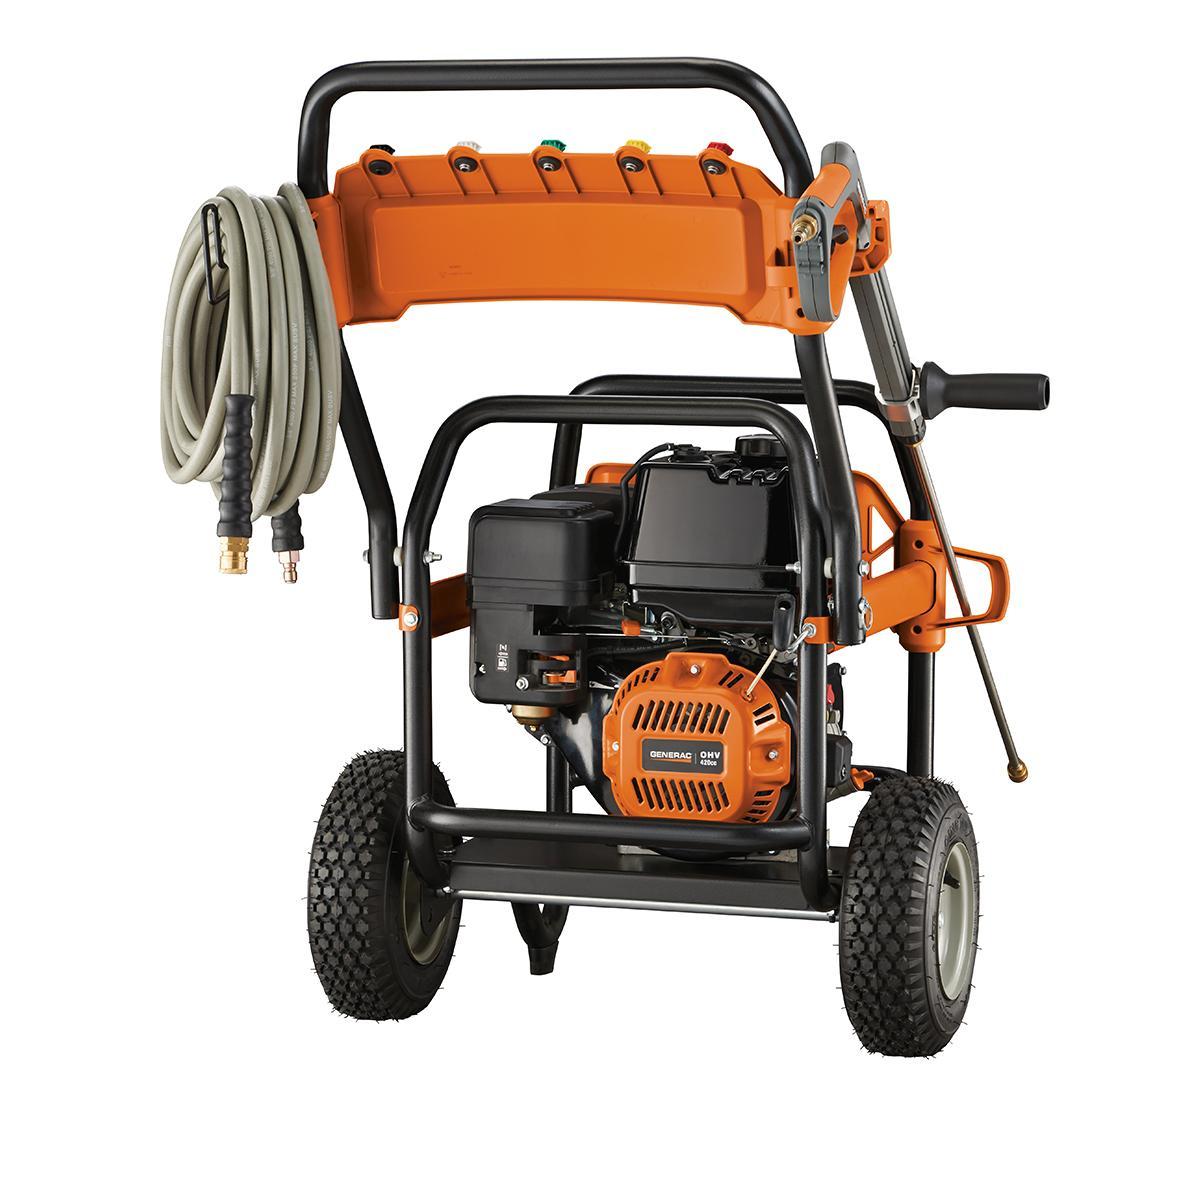 Amazon Com Generac 6565 4 200 Psi 4 0 Gpm 420cc Ohv Gas